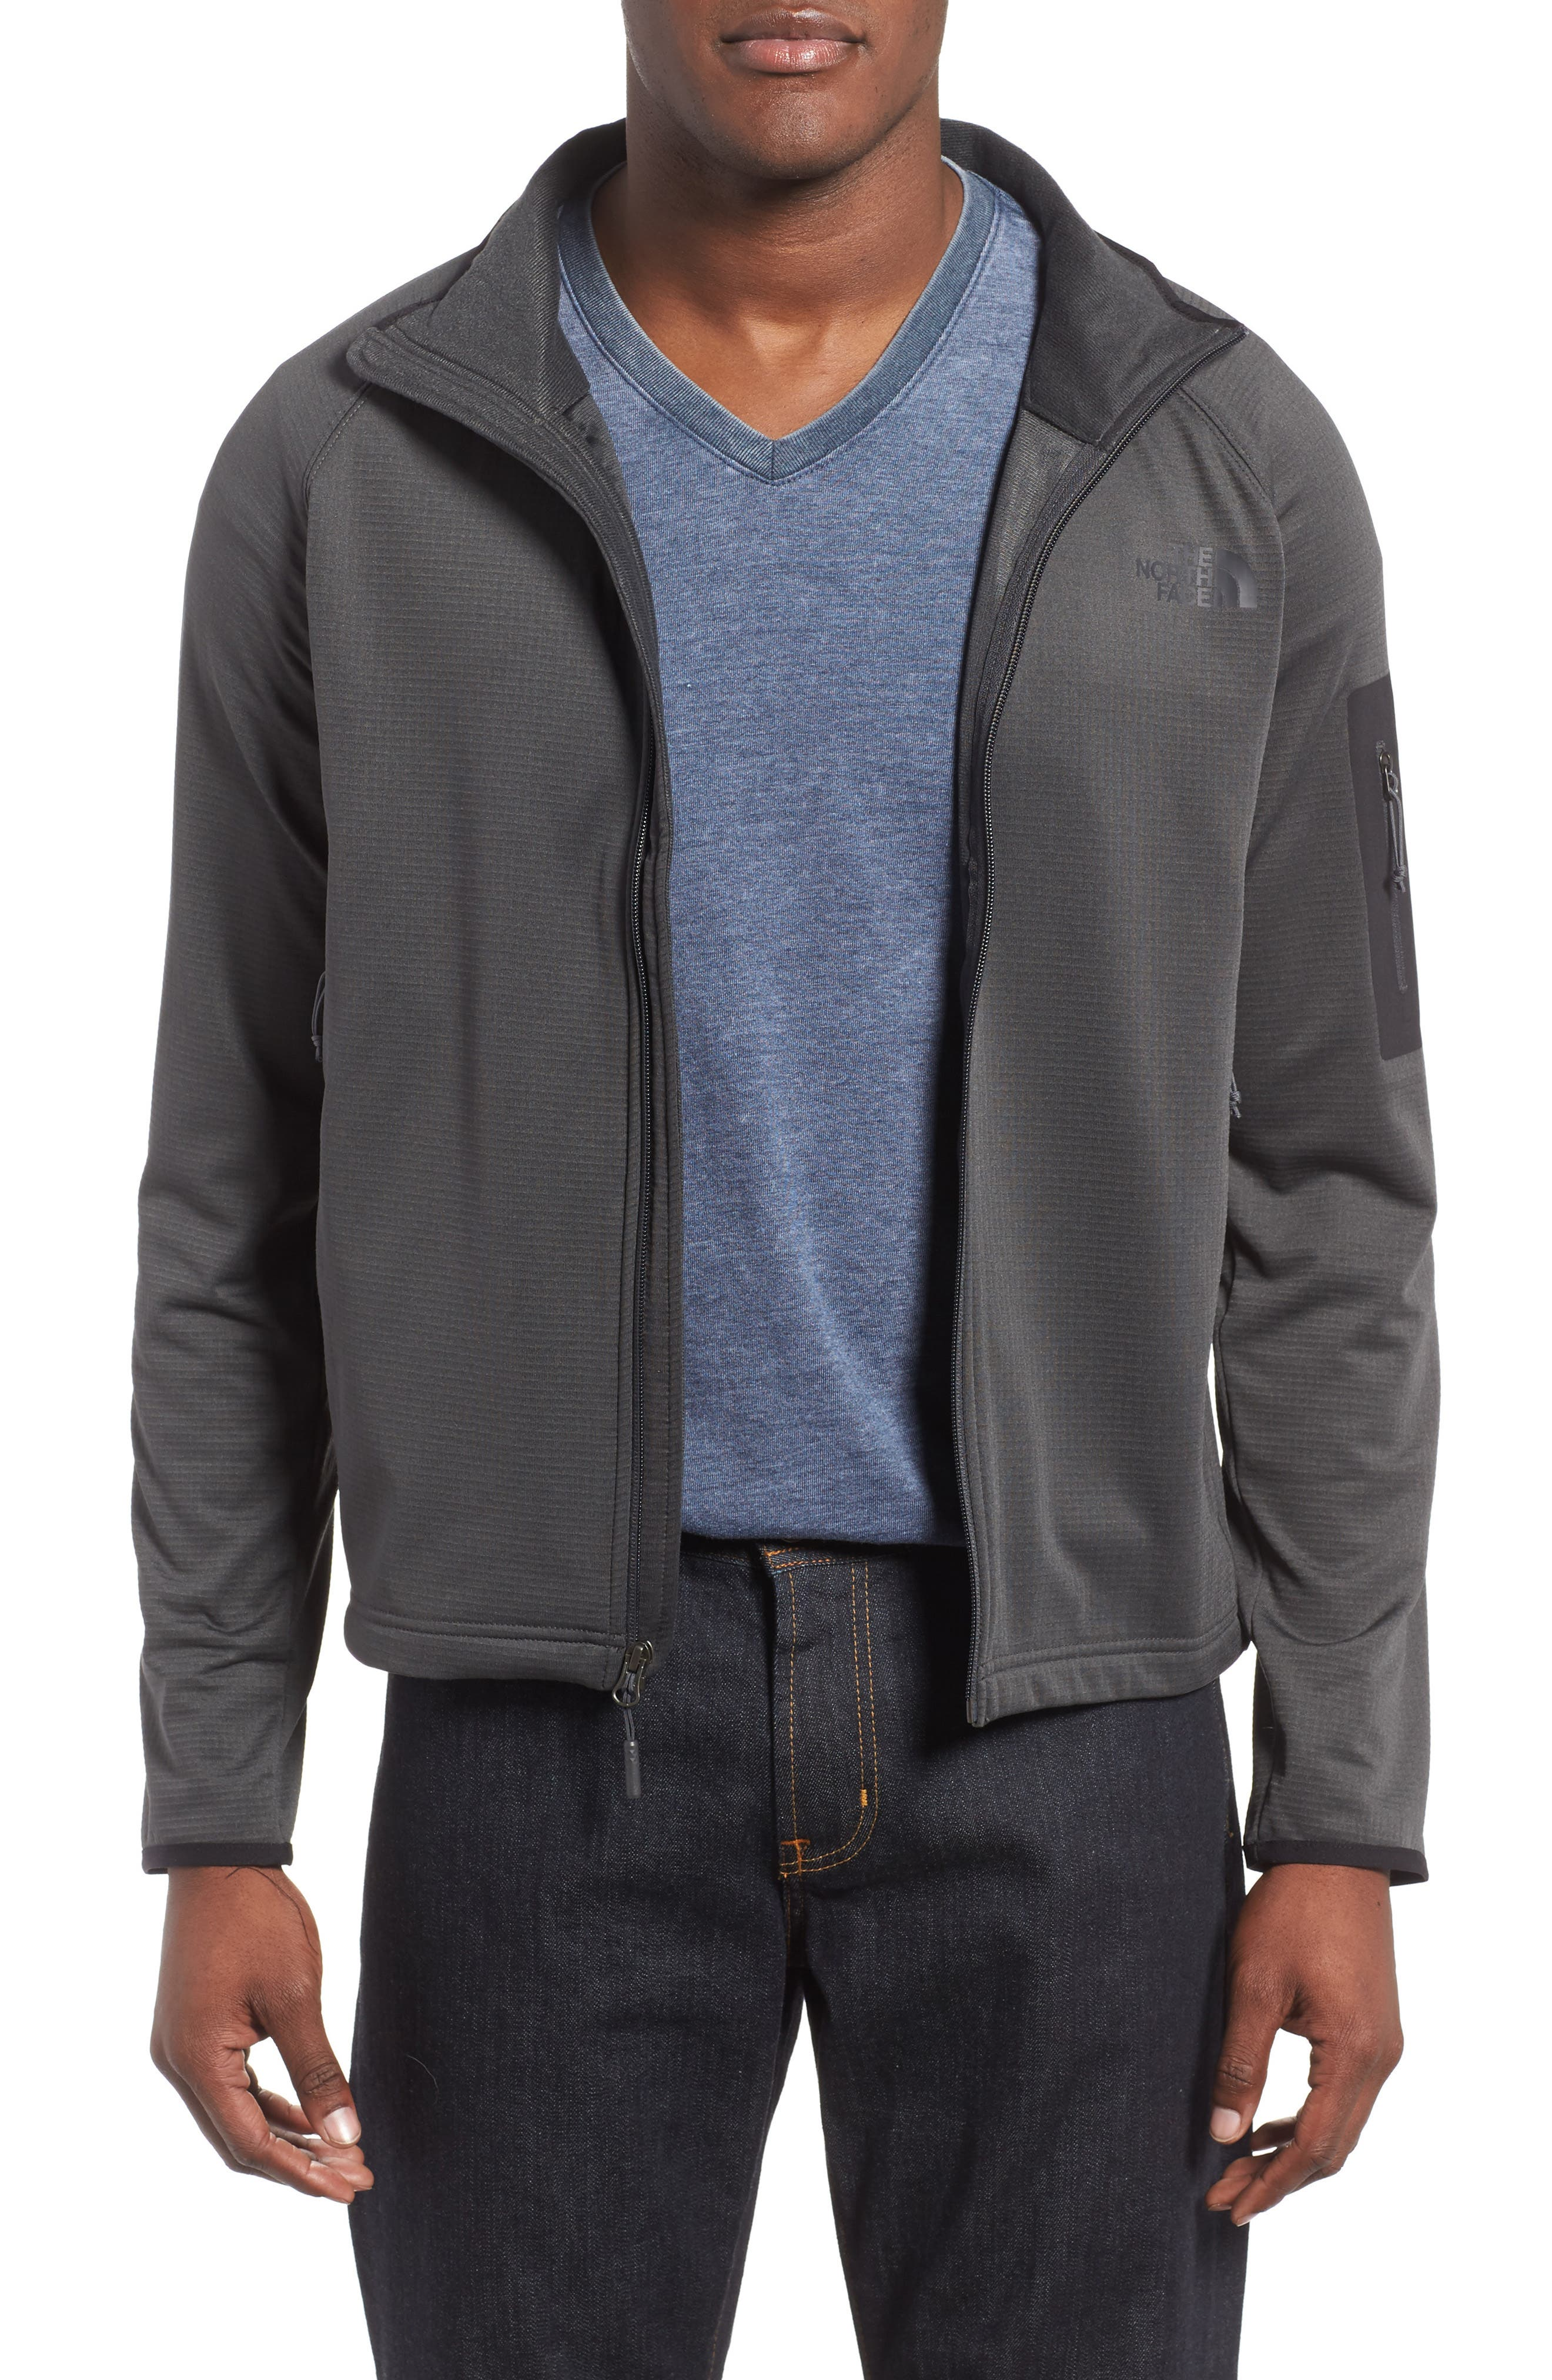 The North Face Borod Jacket